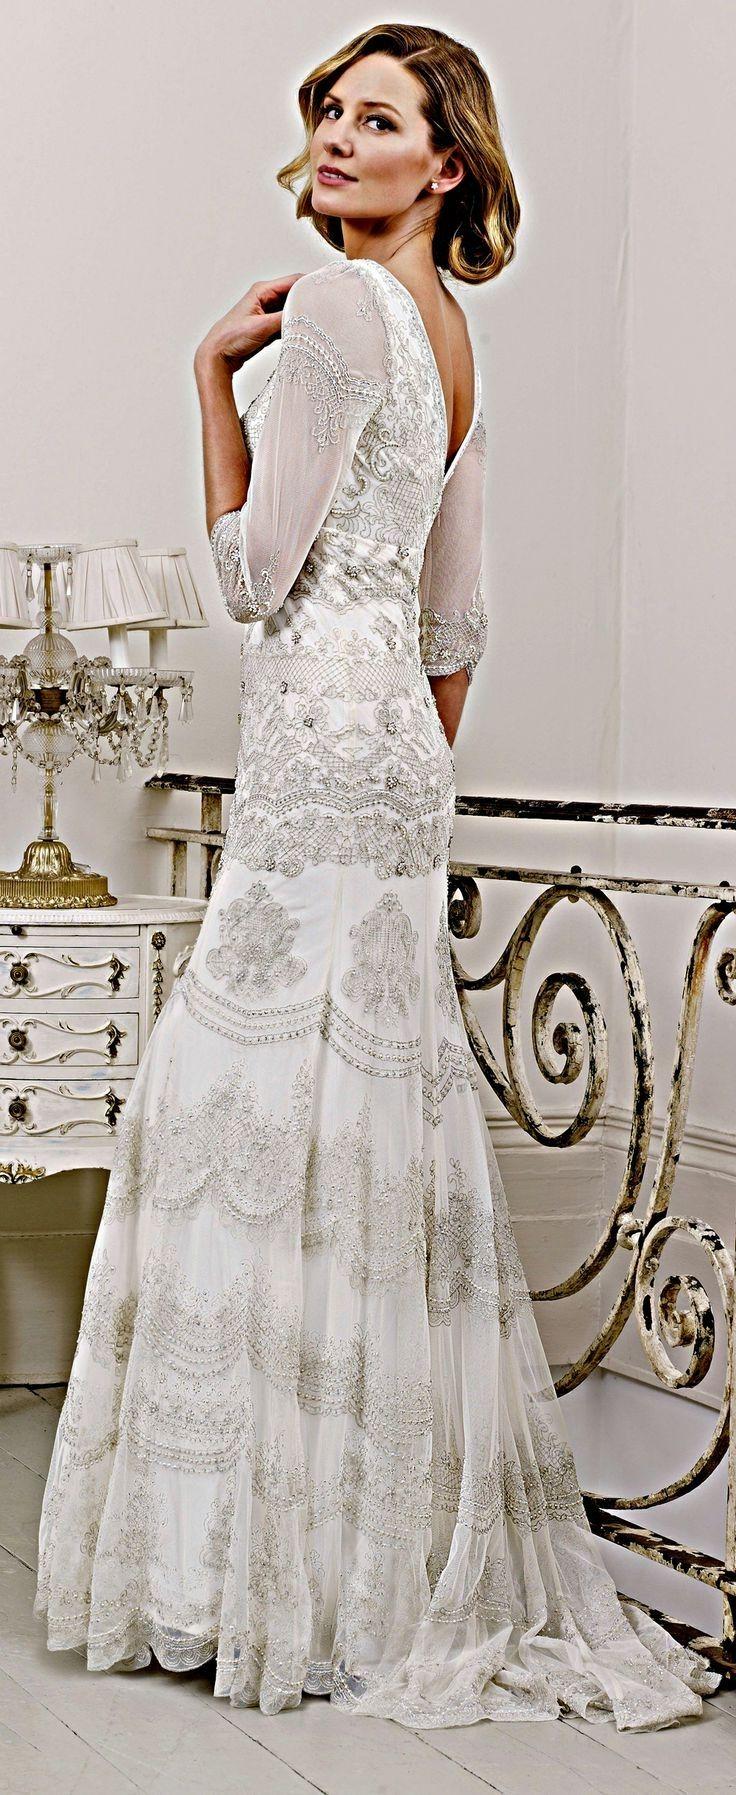 Best 25 Second wedding dresses ideas on Pinterest  Casual white wedding dress Vow renewal